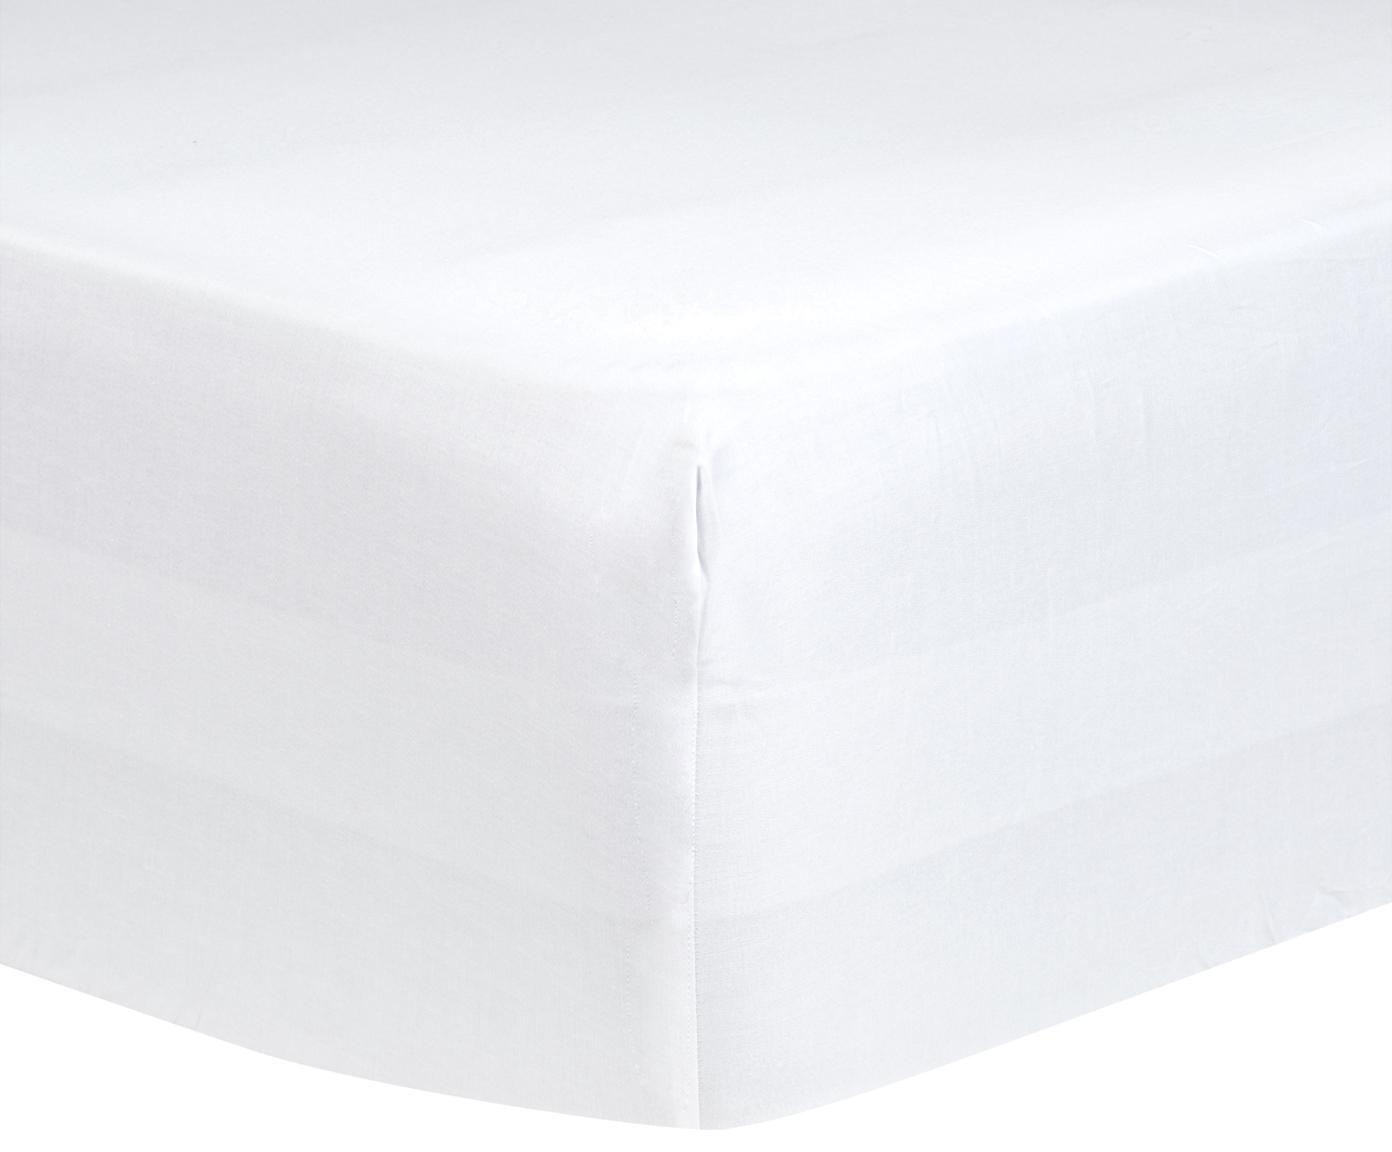 Sábana bajera para boxspring de algodón Comfort, Blanco, Cama 90 cm (90 x 200 cm)